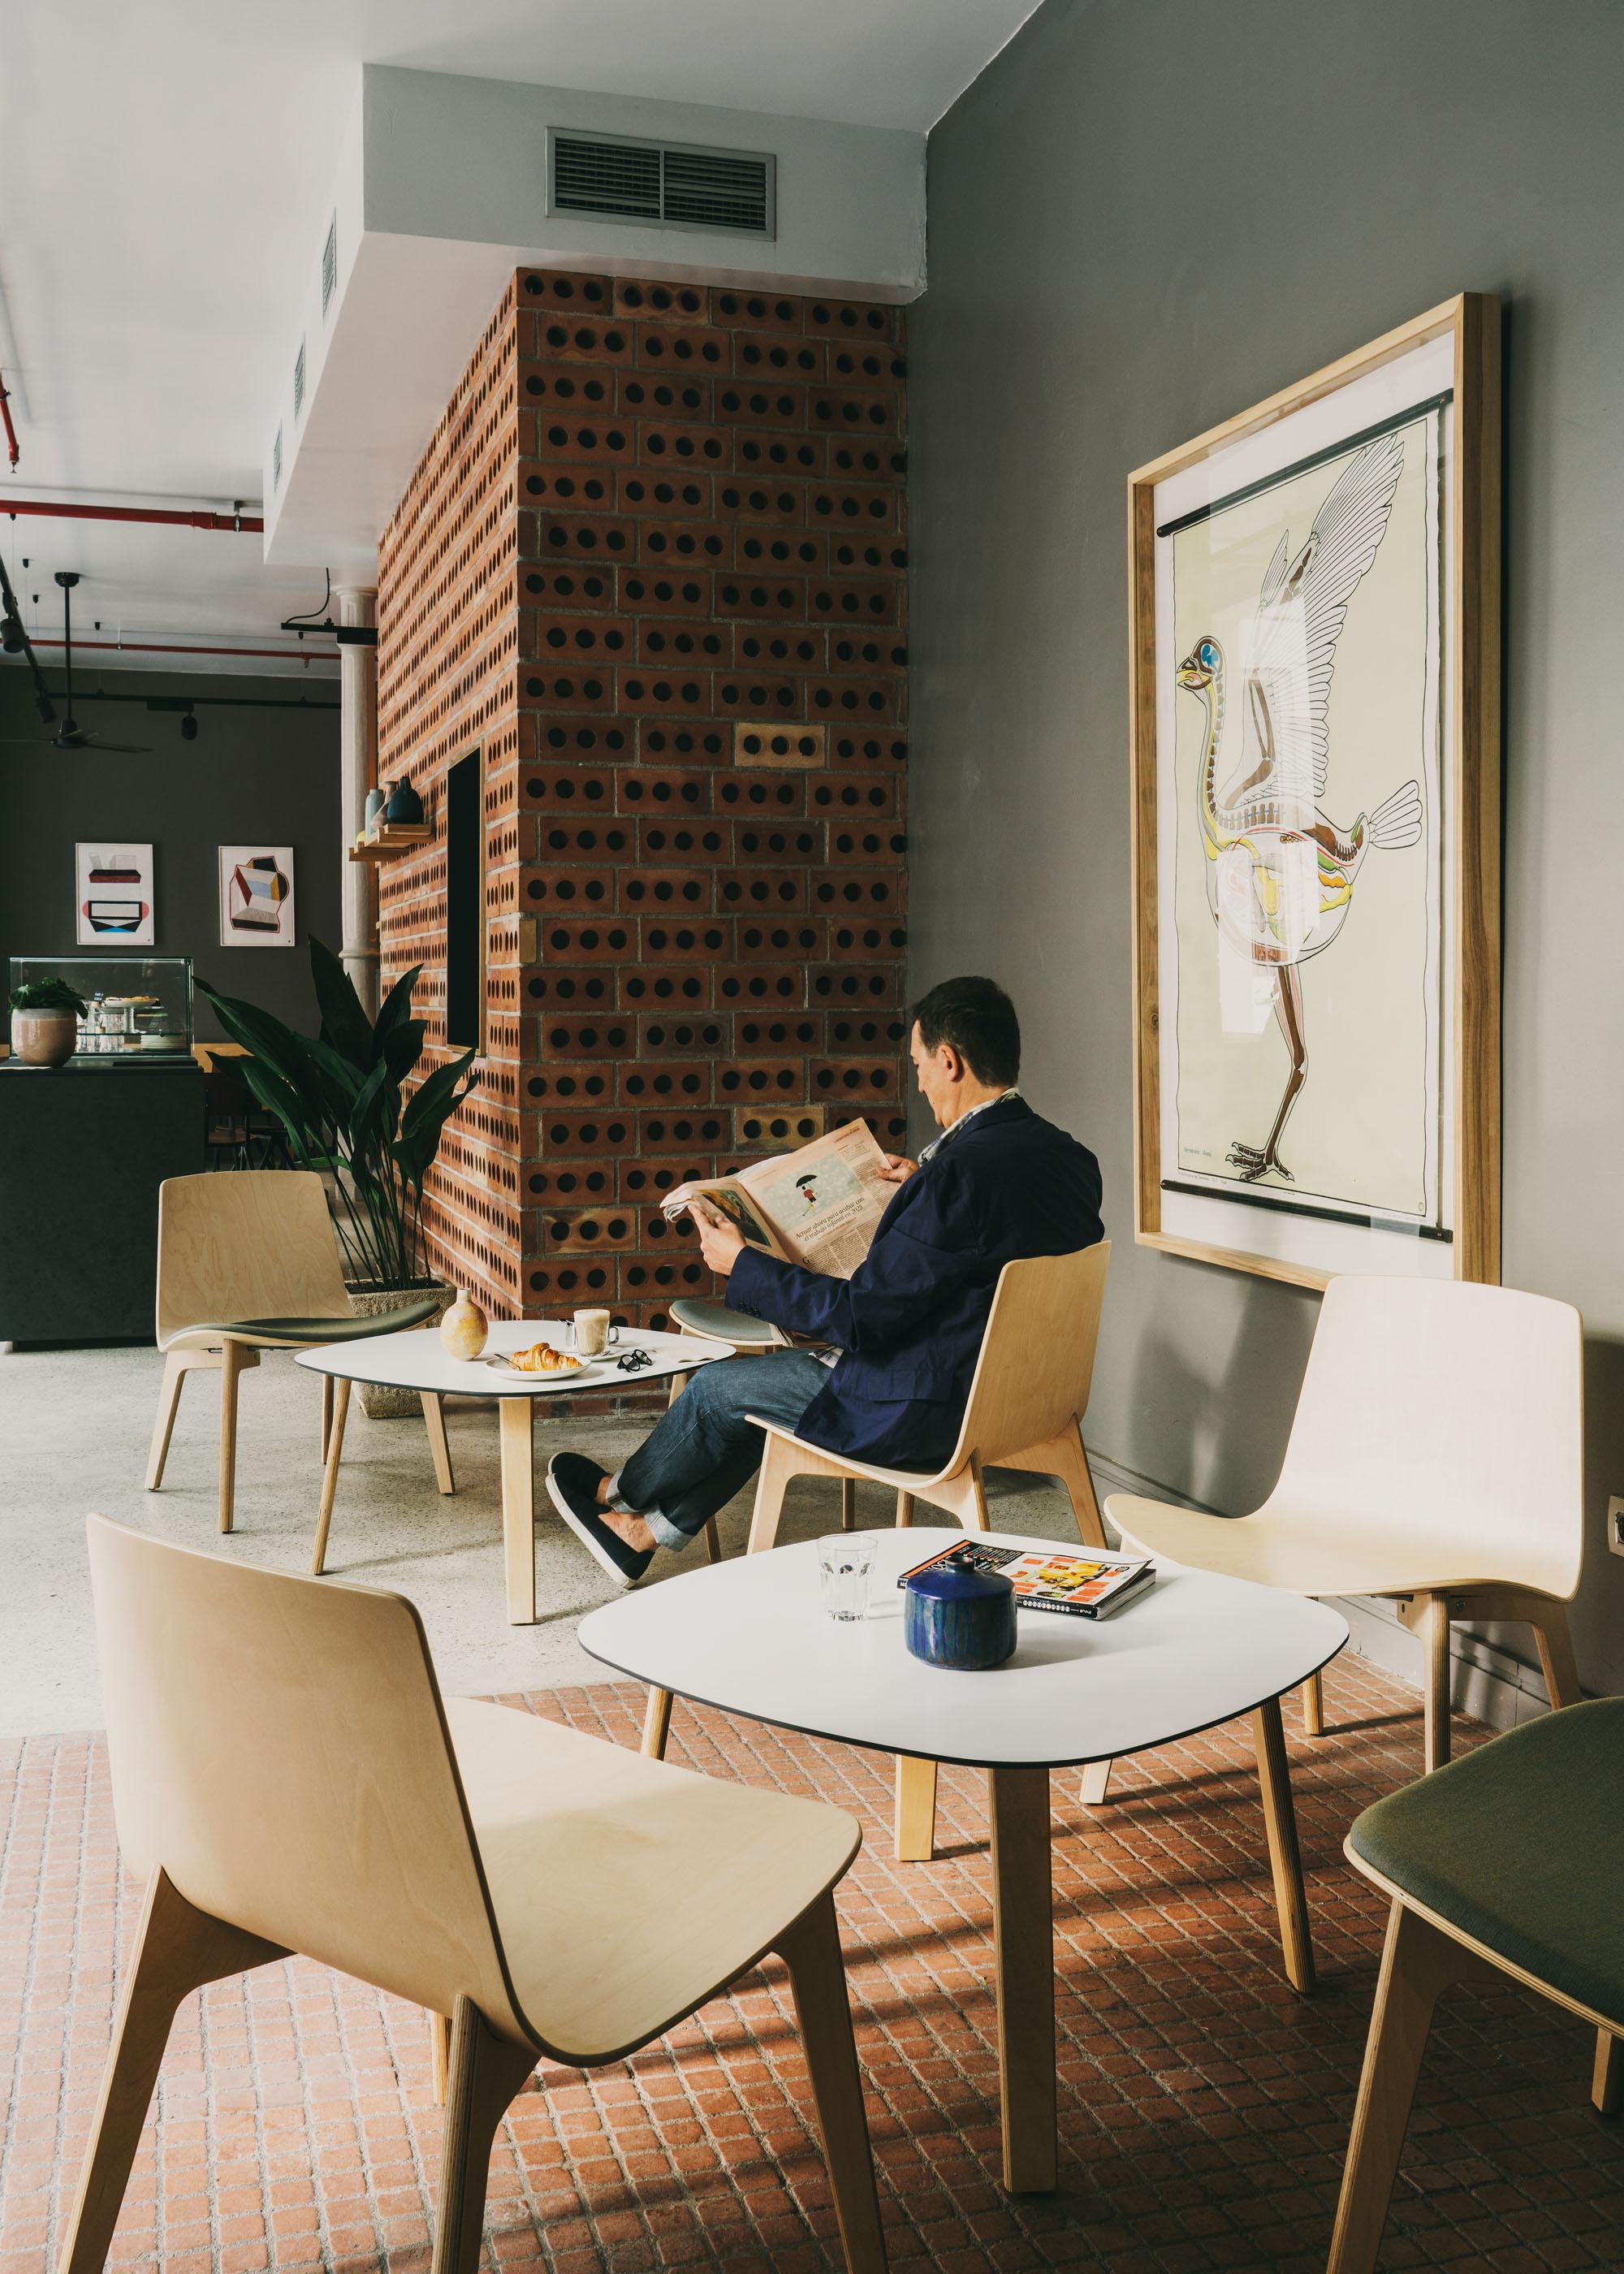 #furniture #enea #design #clase #chairs #barcelona #interiors #federal #cafe